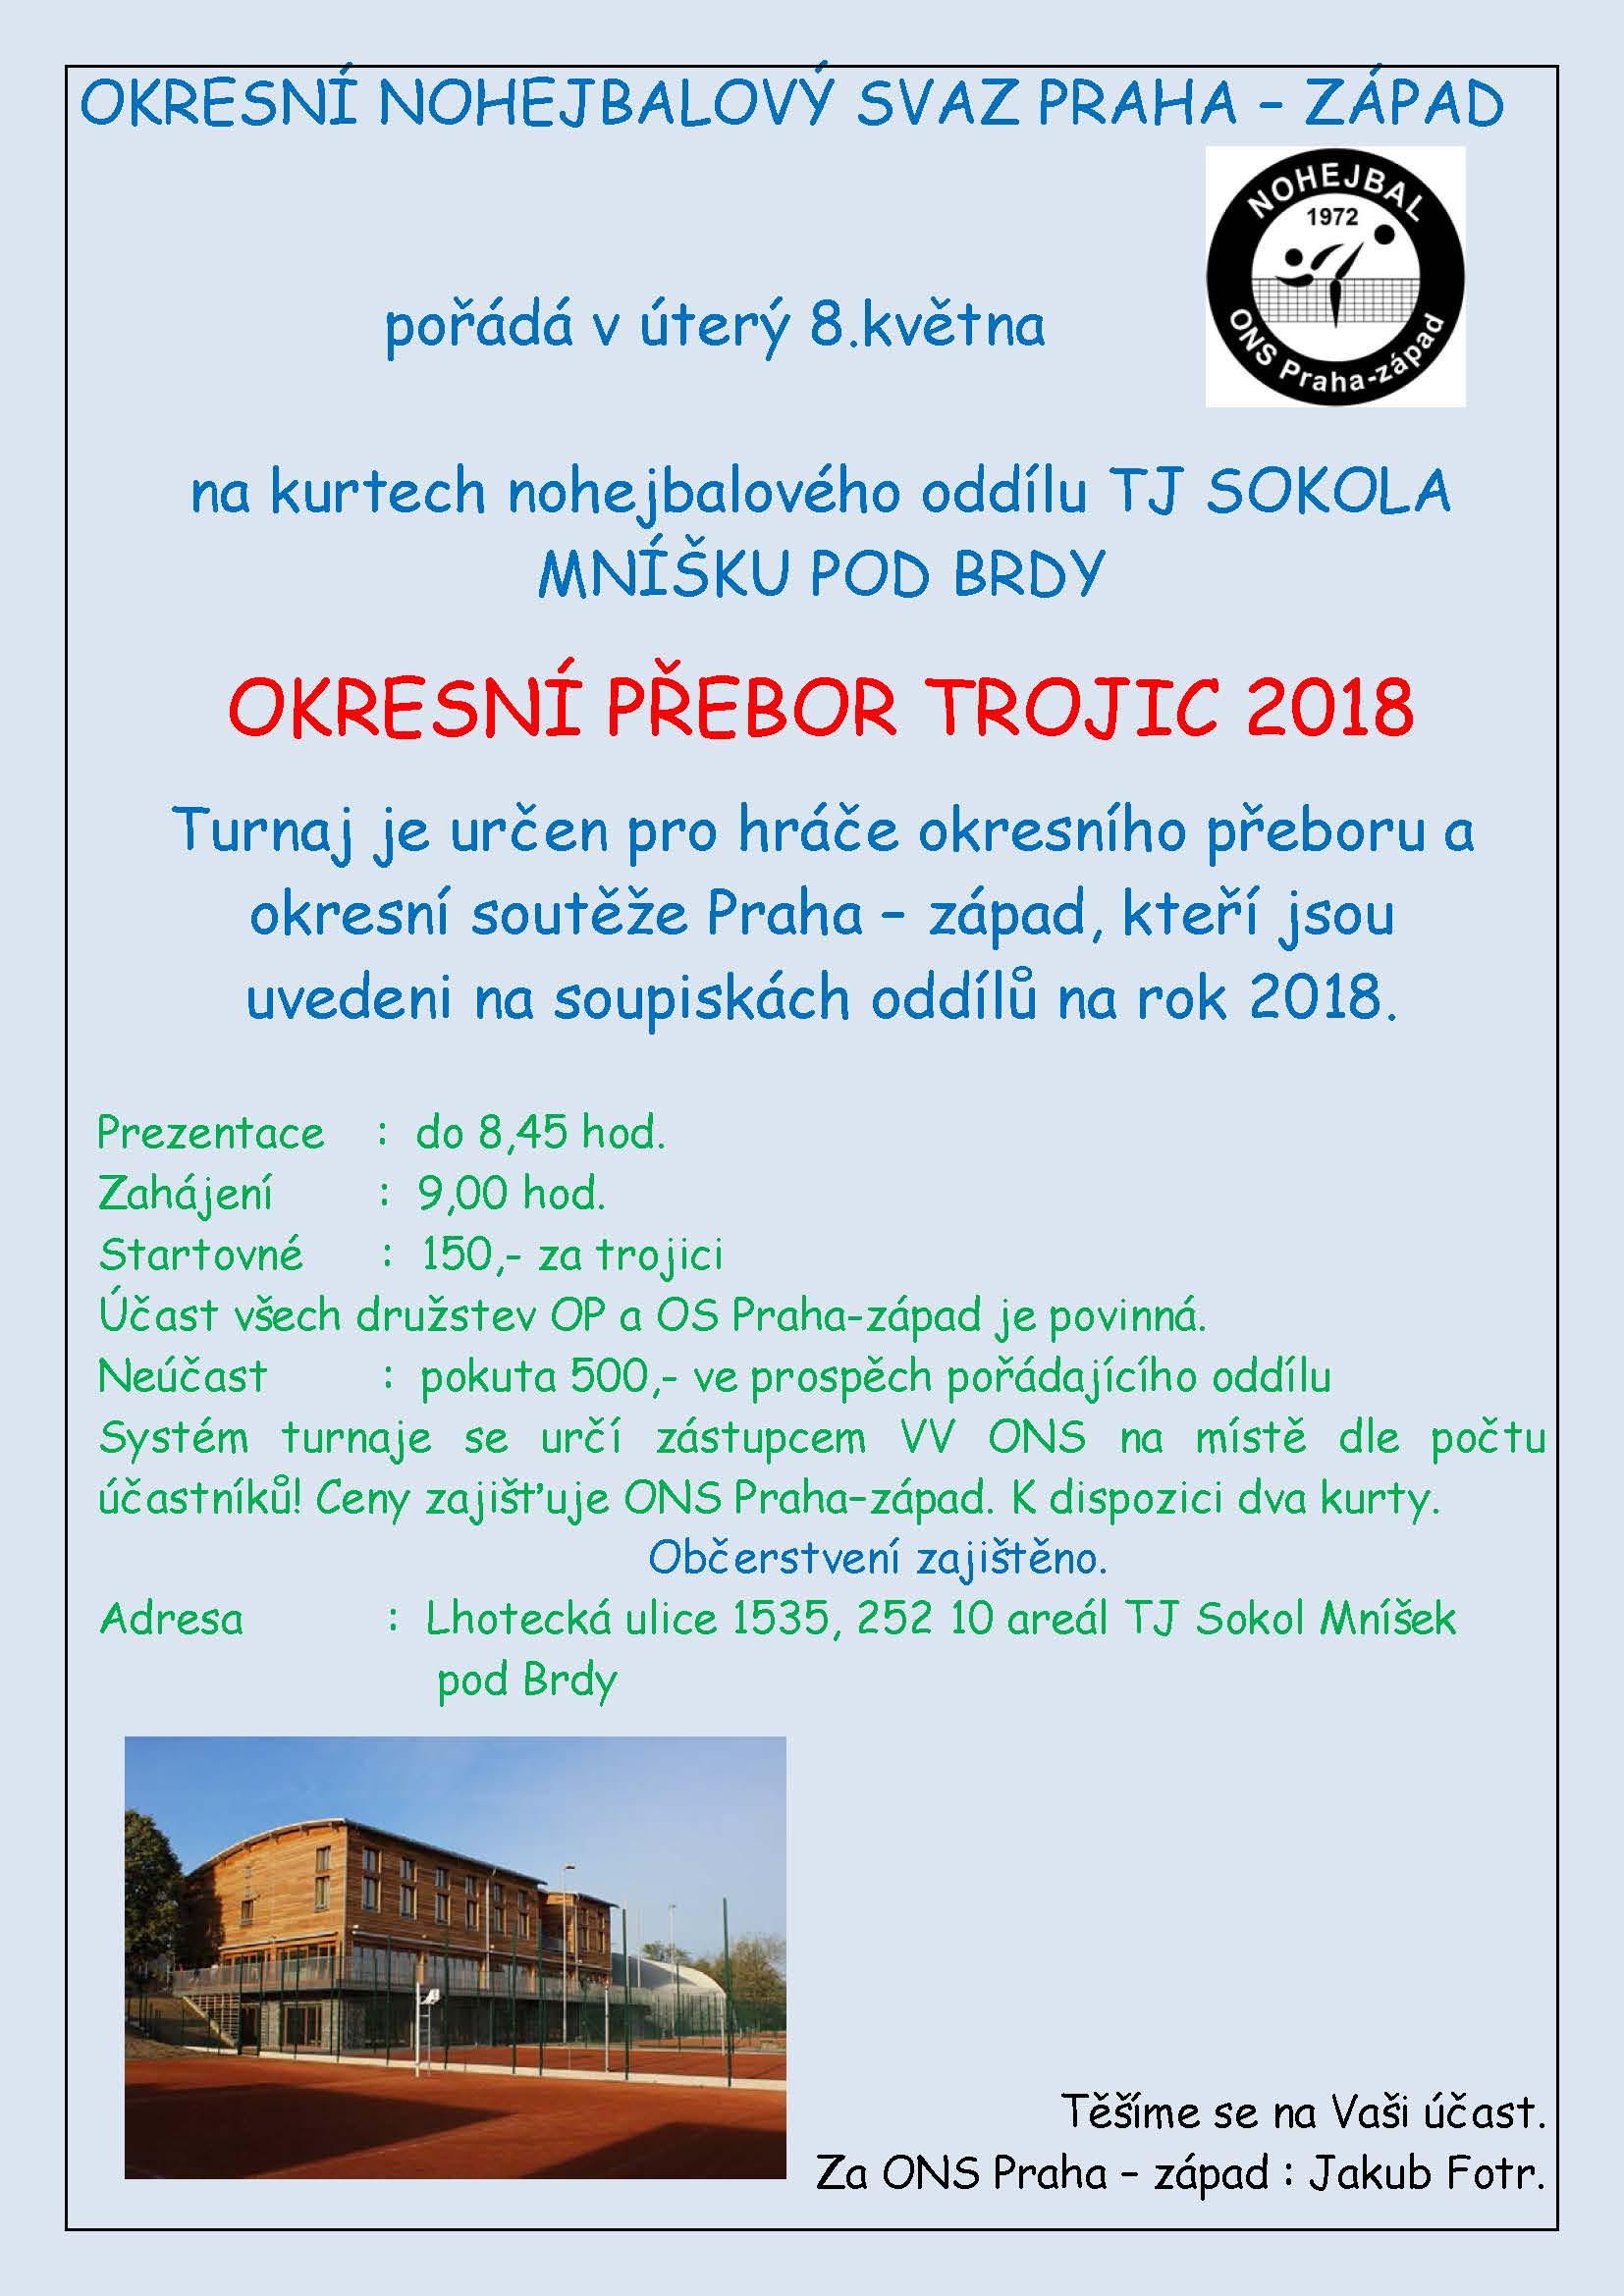 pozvanka-op-trojic-2018.jpg